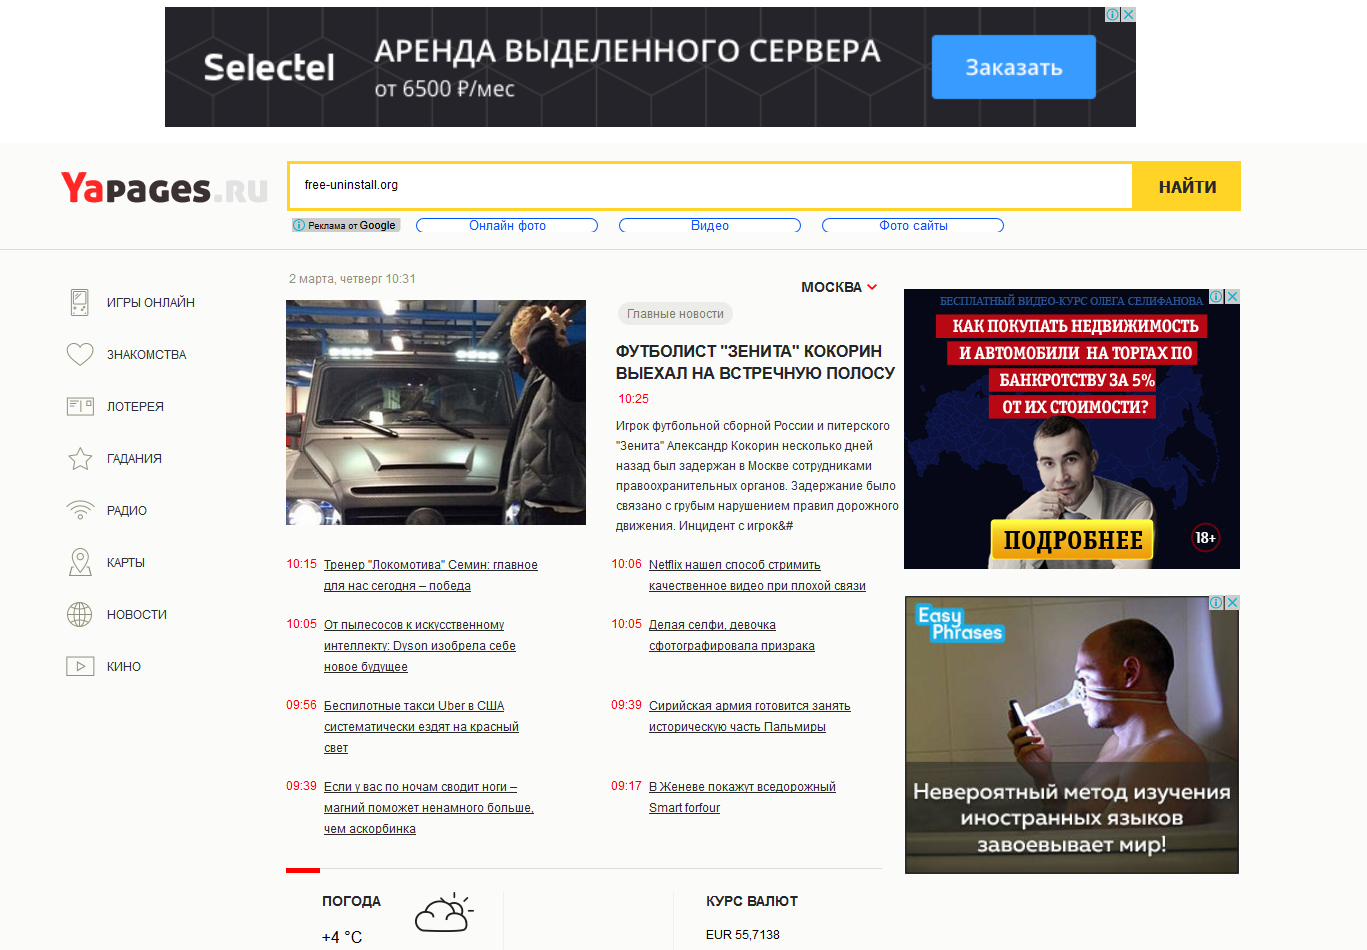 Yapages.ru Hijacker